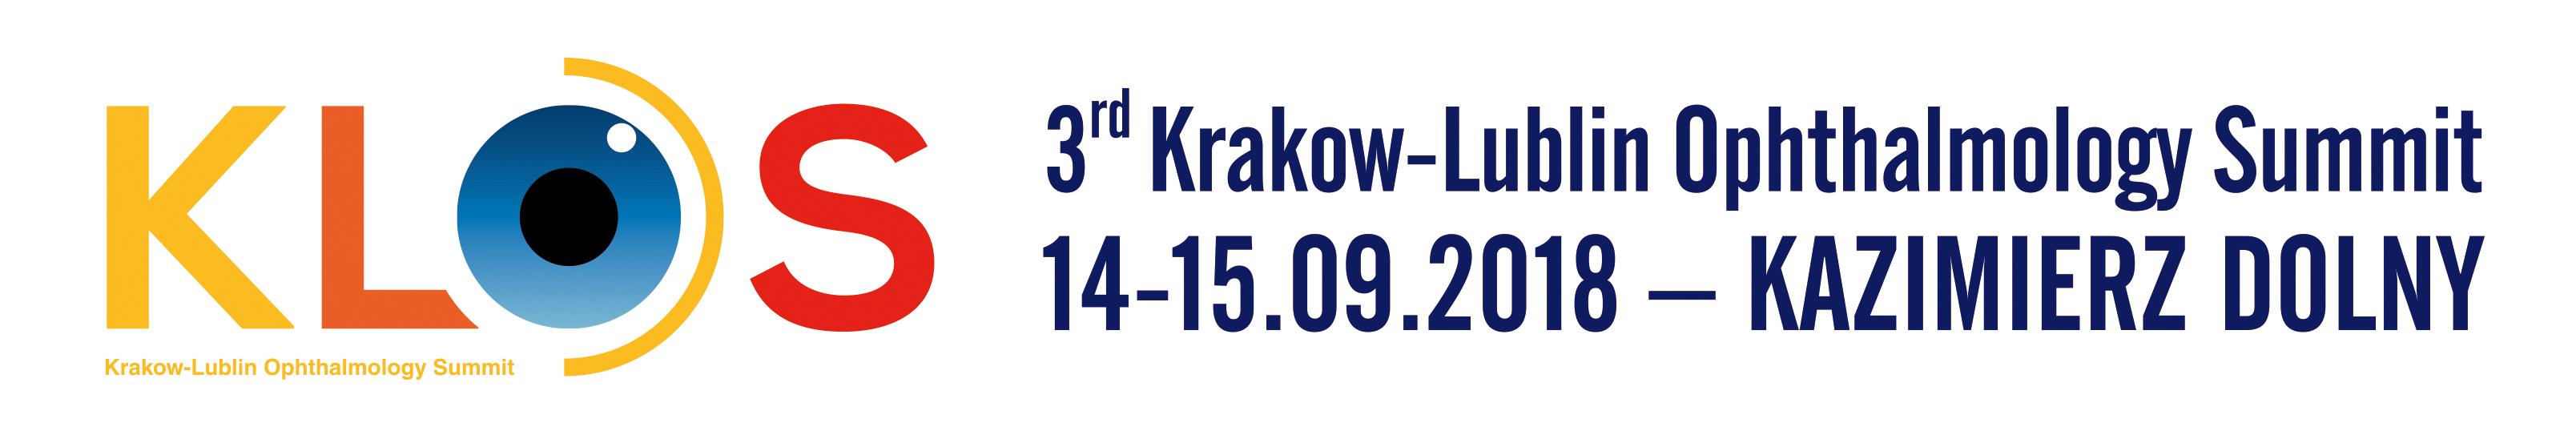 3rd Kraków-Lublin Ophthalmology Summit KLOS